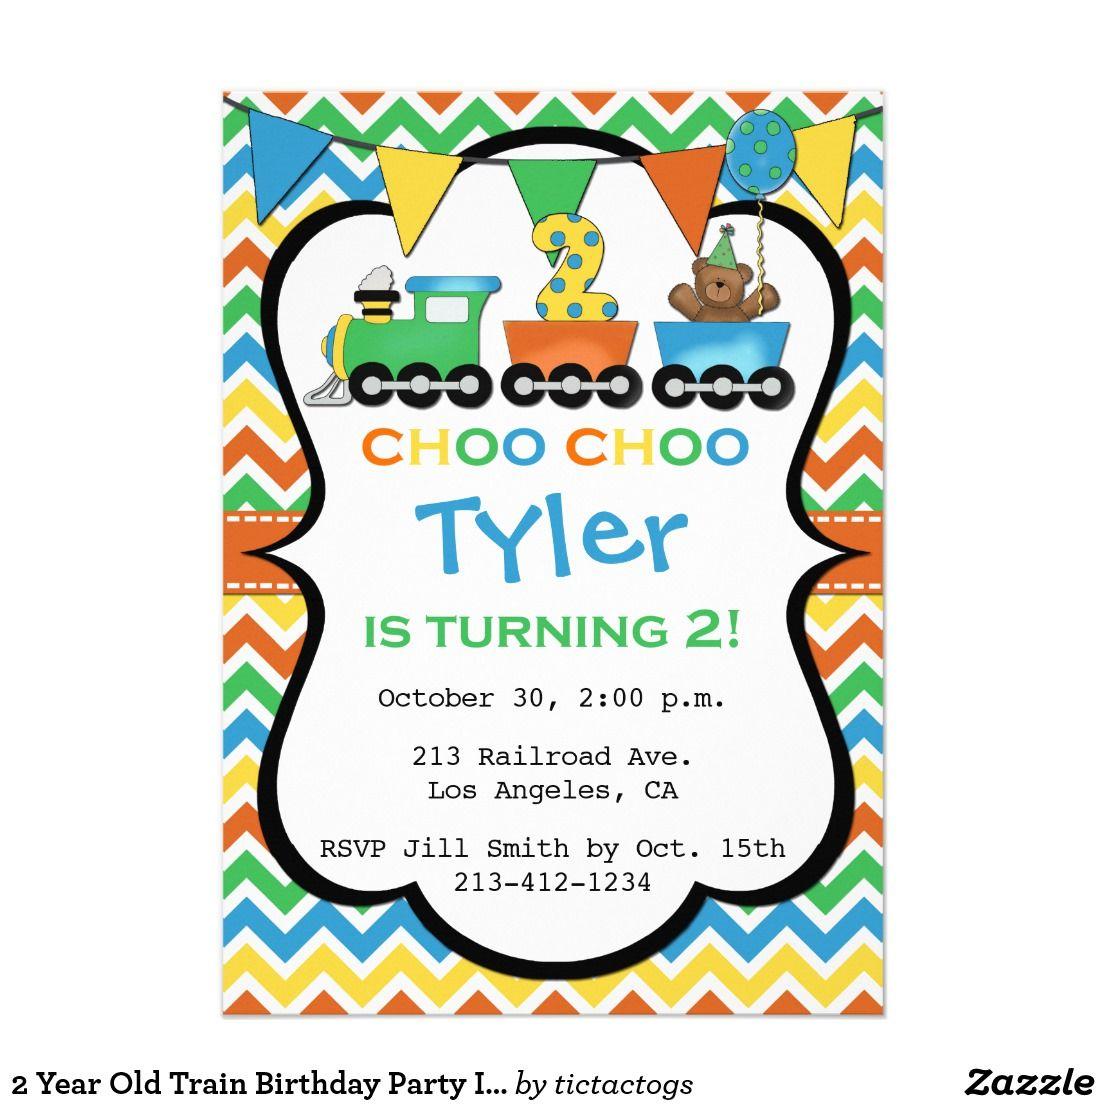 2 Year Old Train Birthday Party Invitation